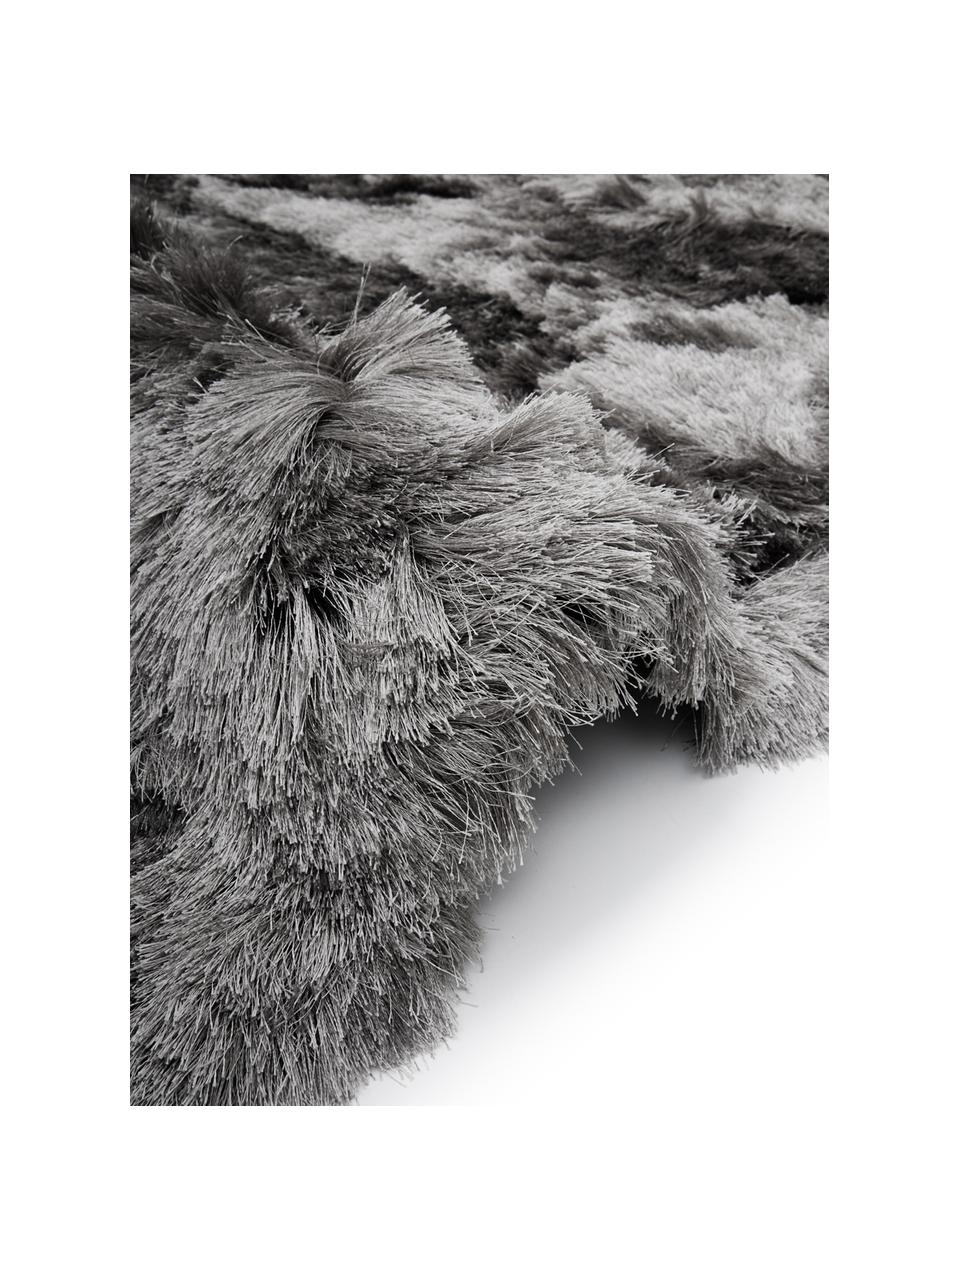 Glänzender Hochflor-Teppich Jimmy in Hellgrau, Flor: 100% Polyester, Hellgrau, B 300 x L 400 cm (Größe XL)